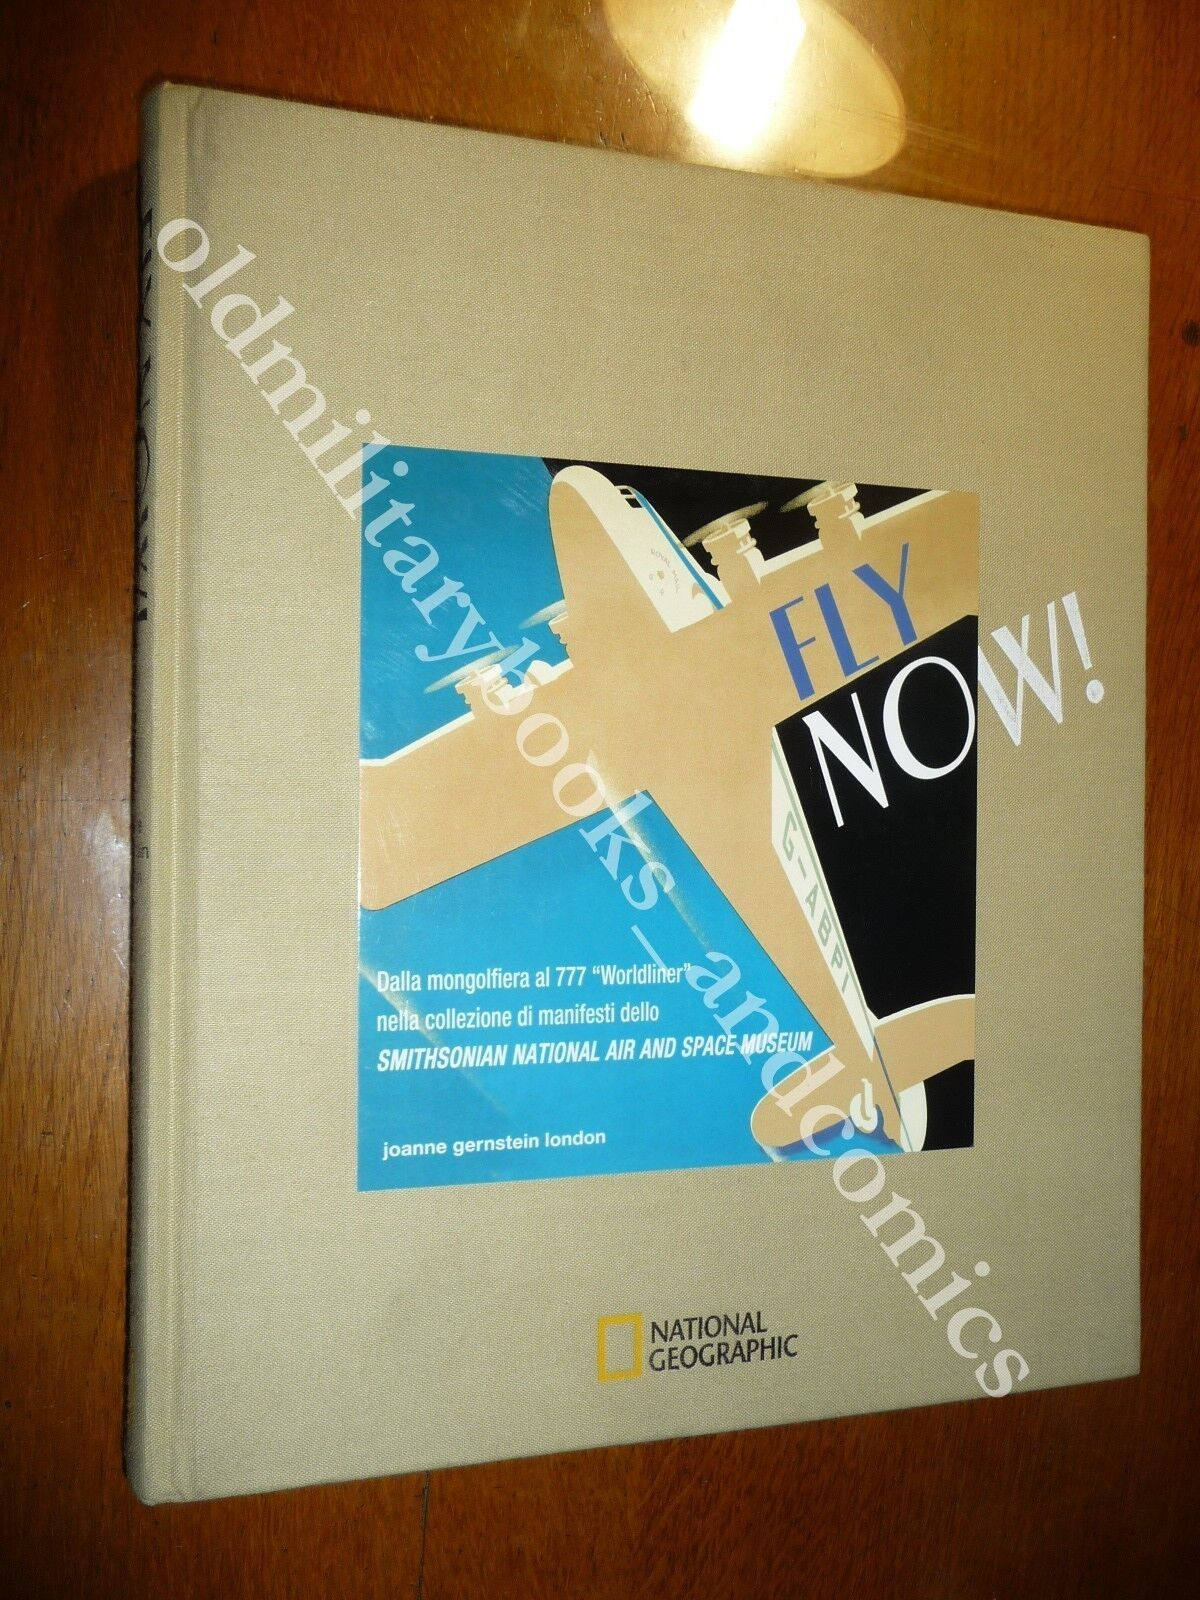 FLY NOW! DALLA MONGOLFIERA AL 777 WORLDLINER NEI MANIFESTI SMITHSONIAN NATIONAL